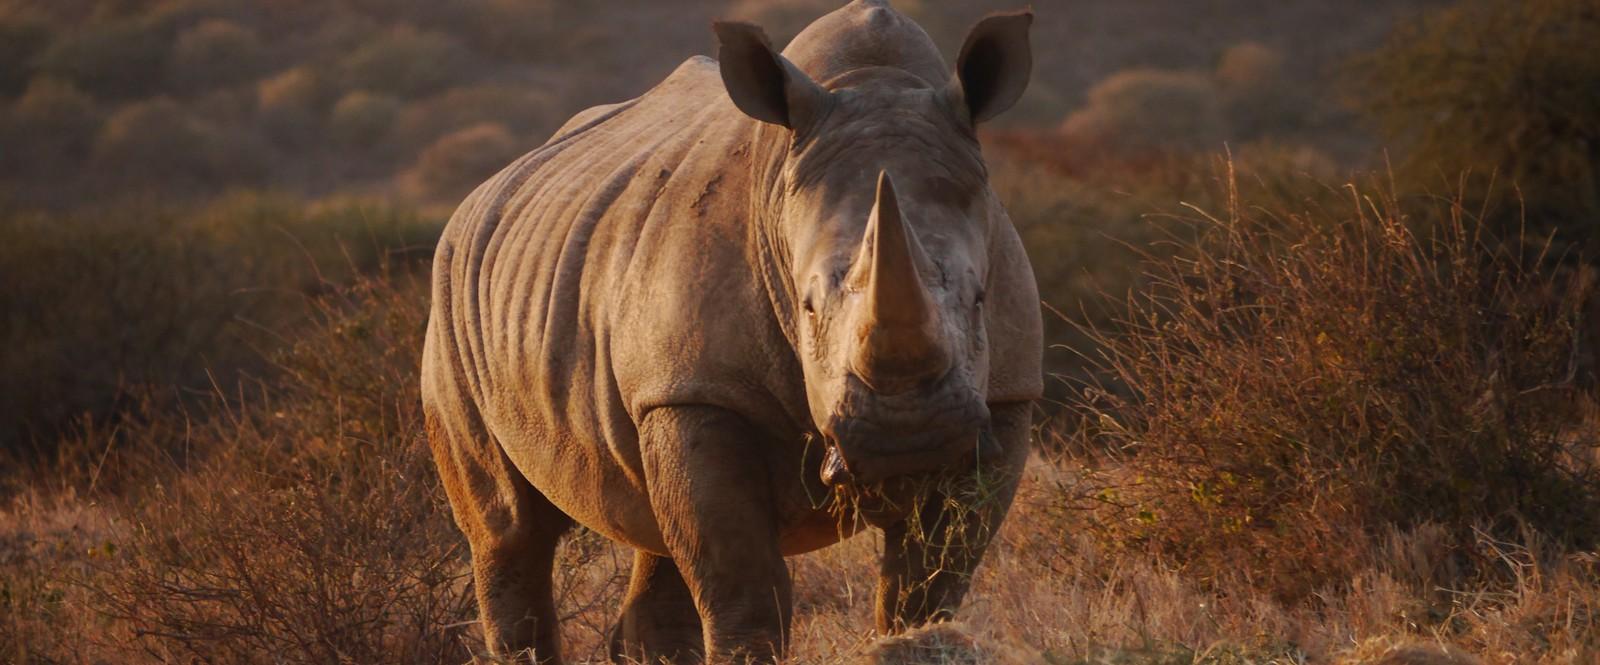 Image of rhino at Ol Jogi Conservancy in Kenya.